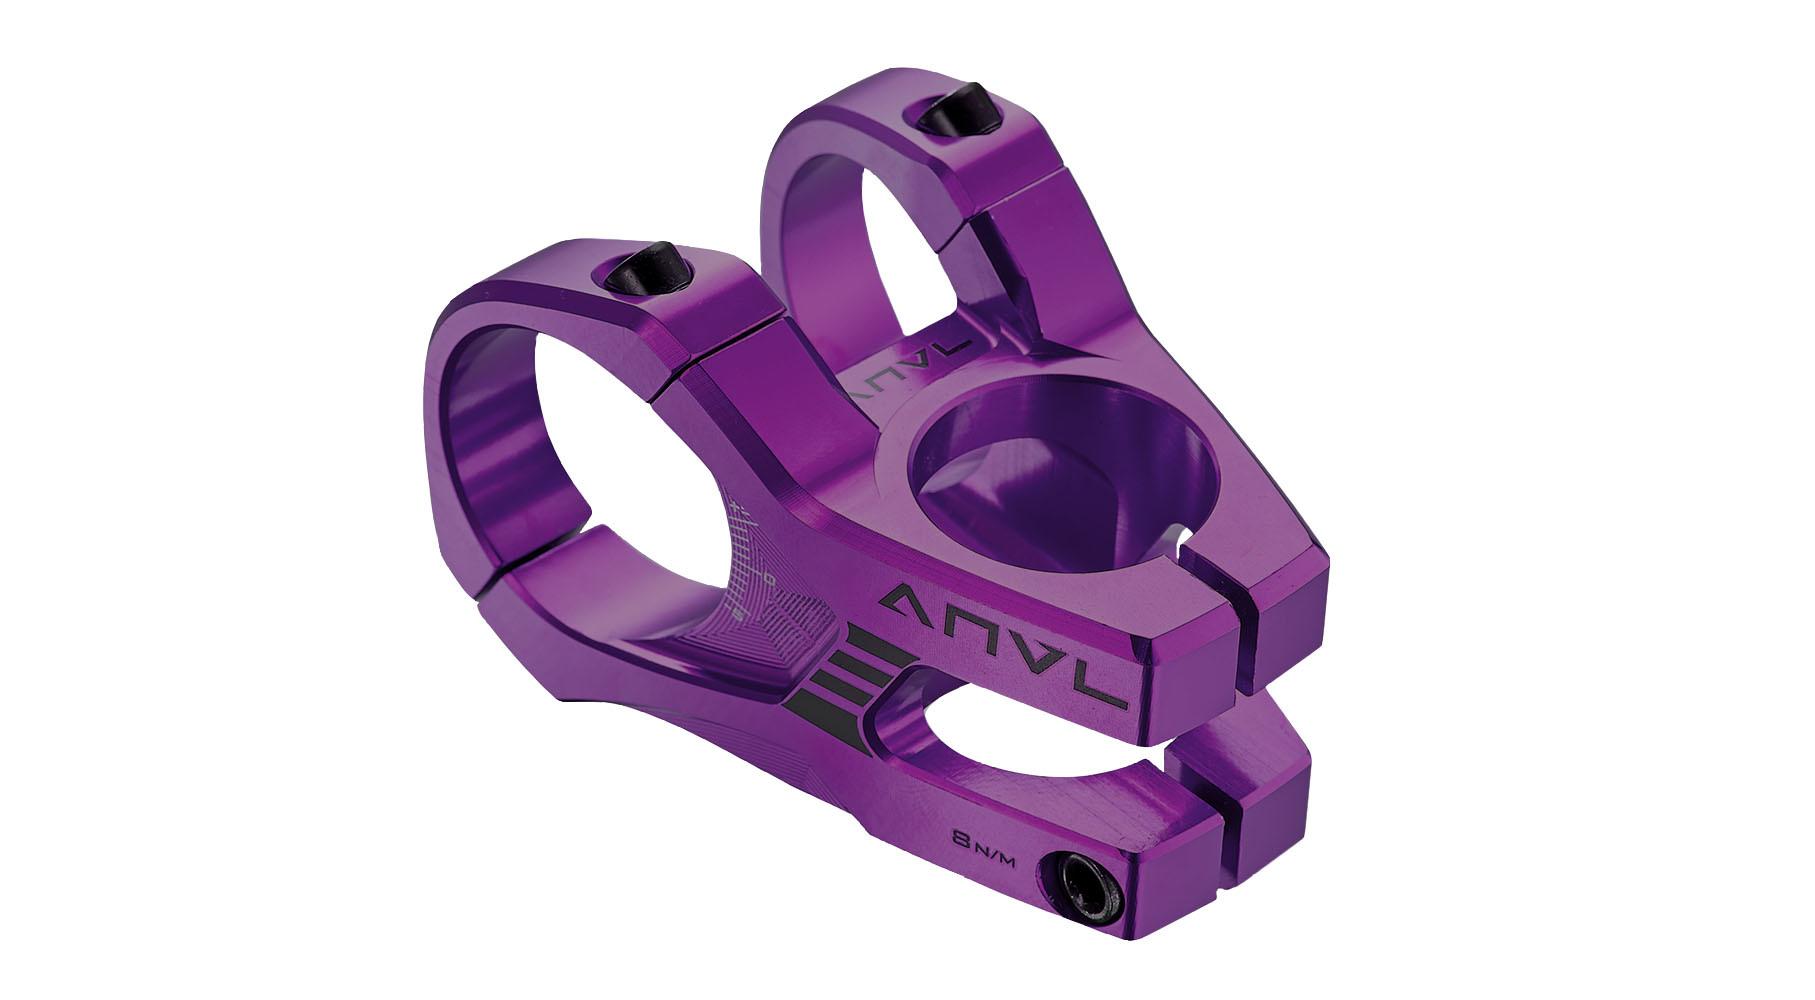 ANVL Components - Swage Stem (40mm, Grape)